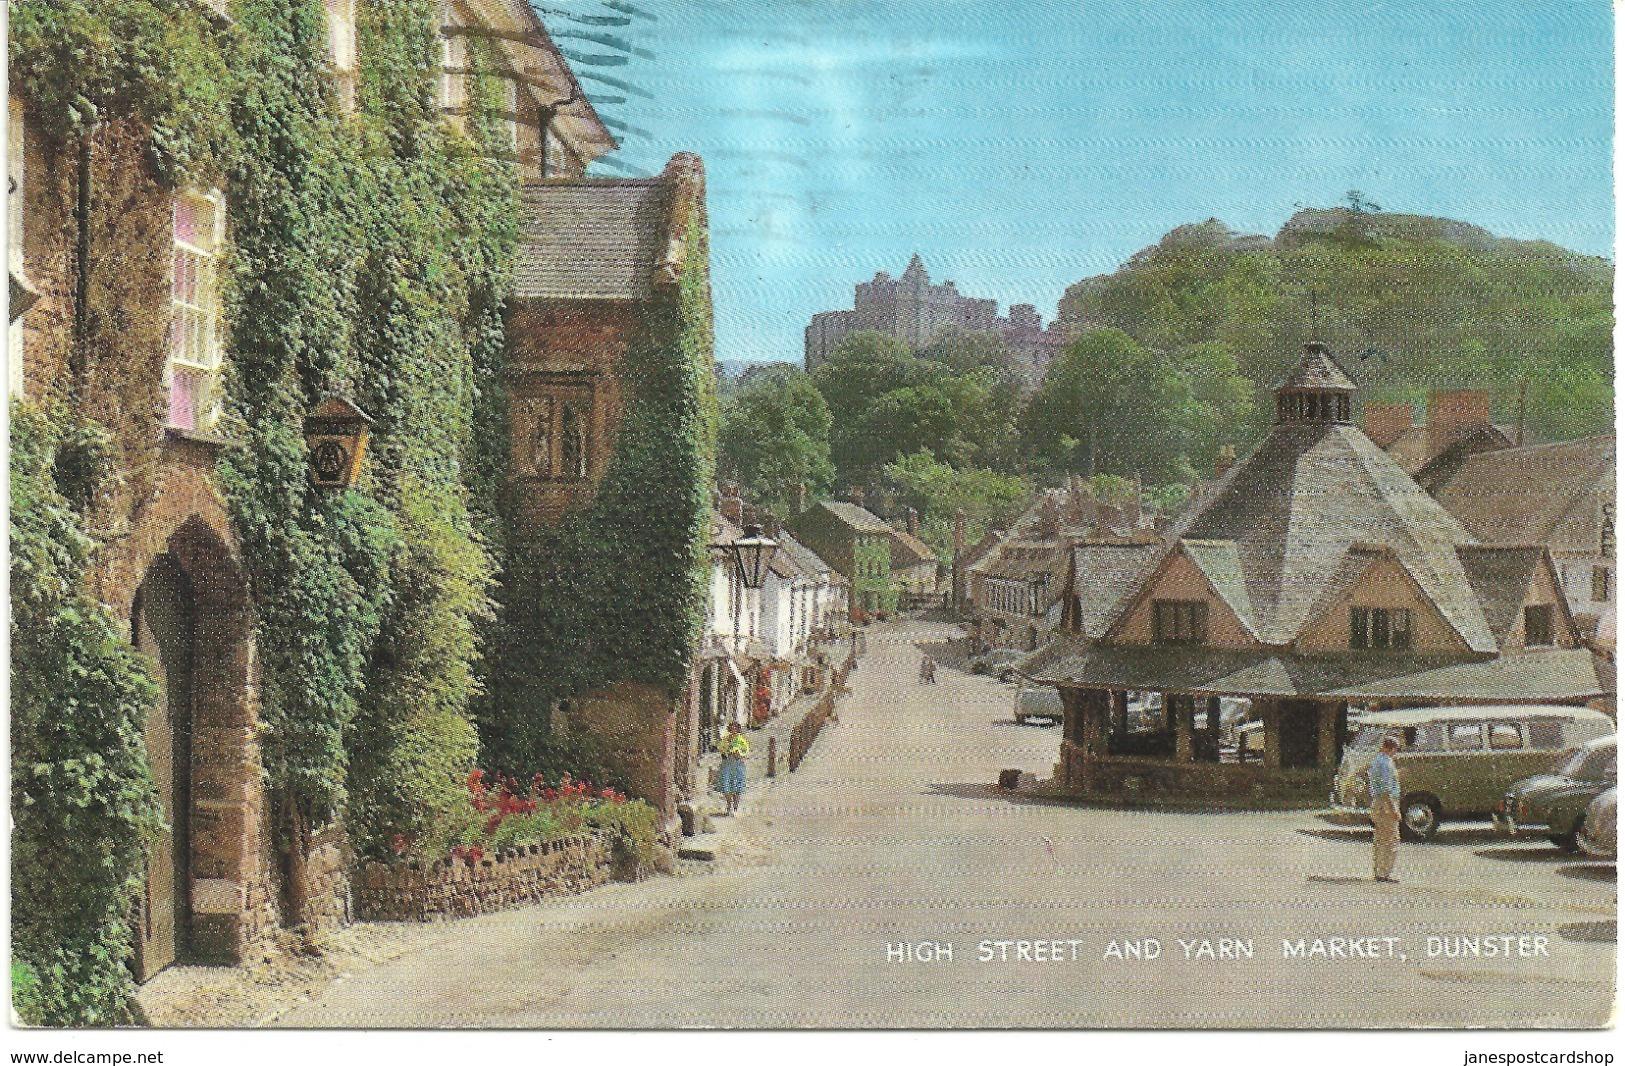 HIGH STREET AND YARN MARKET - DUNSTER - WITH VW GOLF CAMPER VAN - England